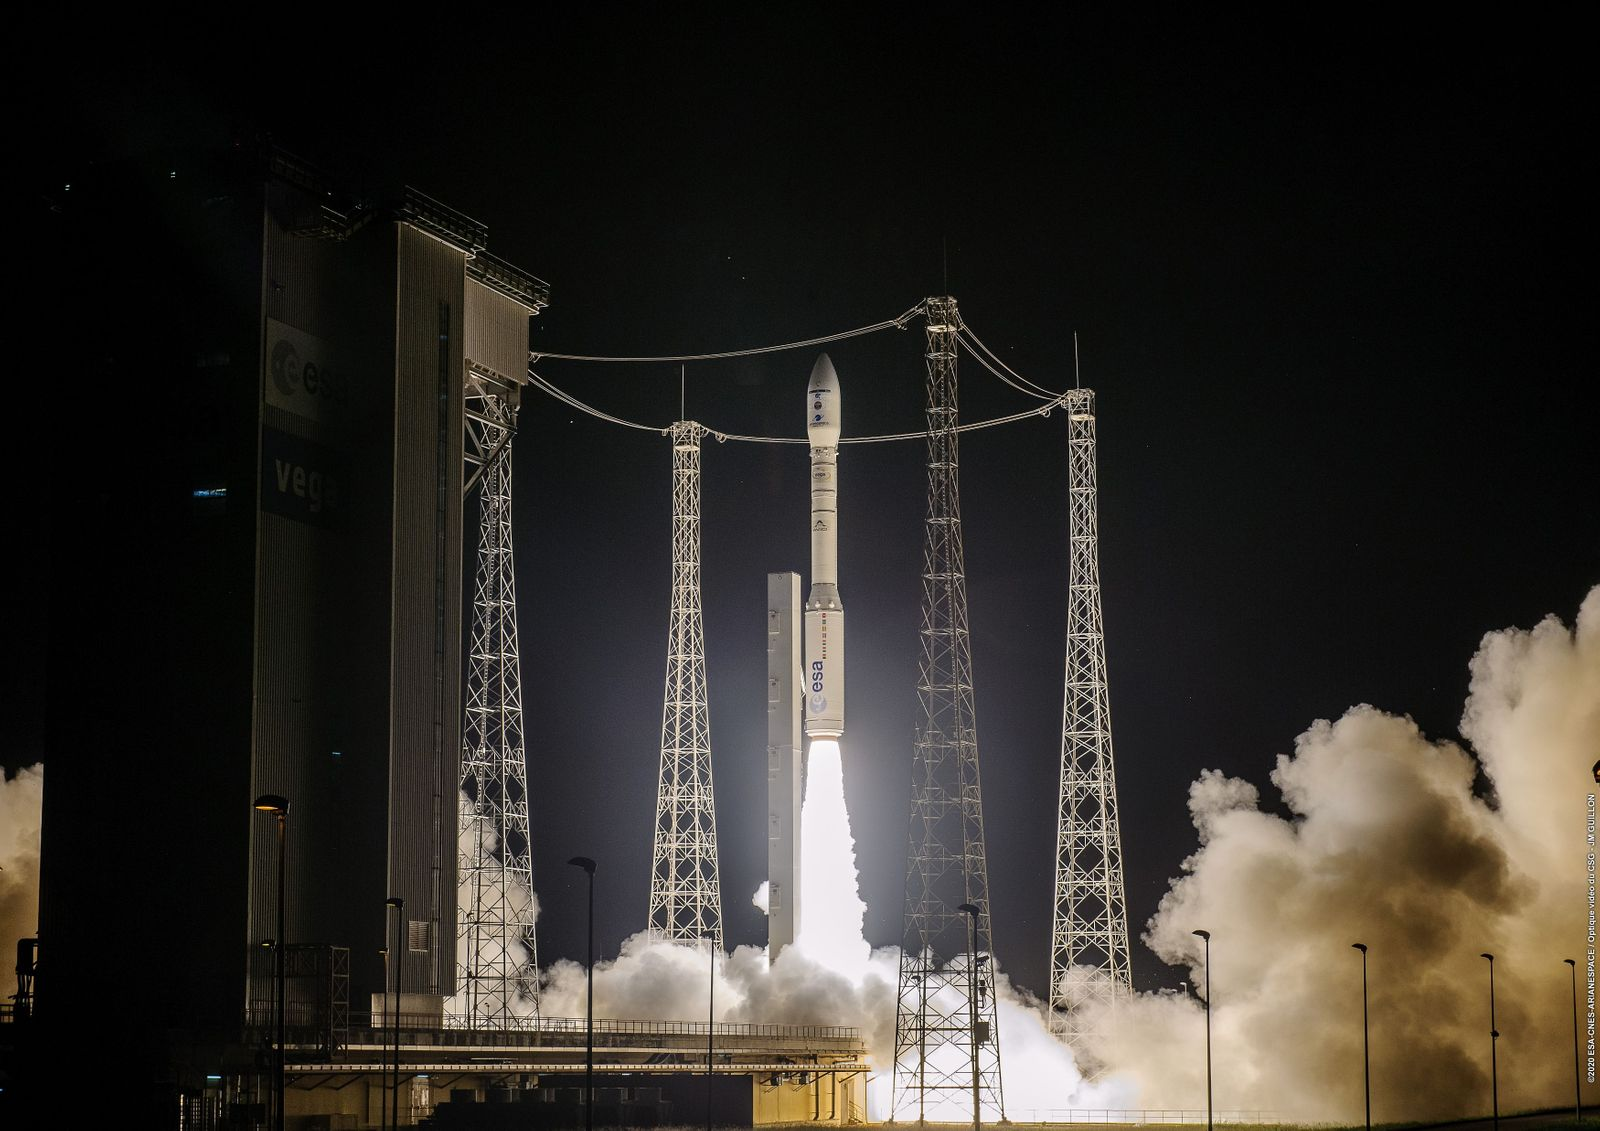 Liftoff SEOSAT-Ingenio, Kourou, French Guiana - 17 Nov 2020